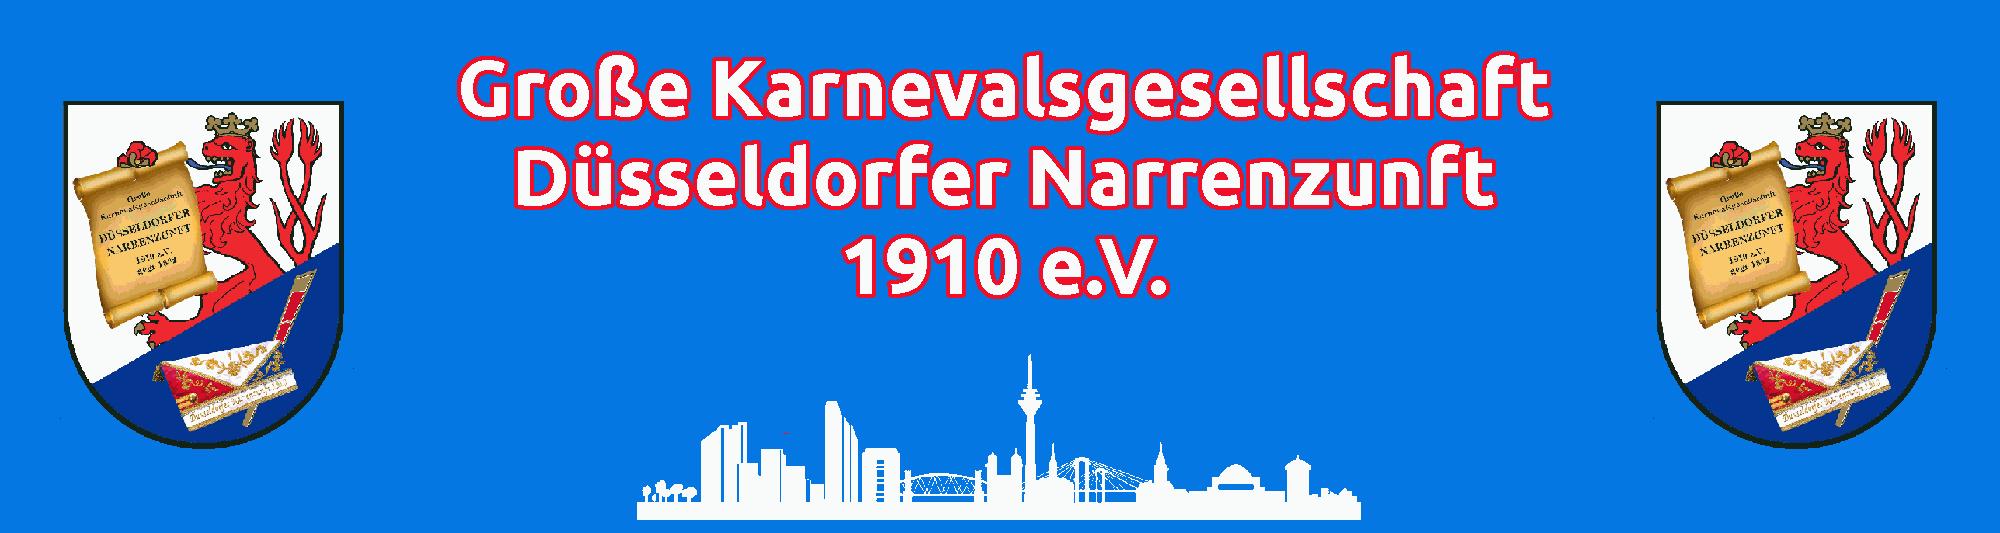 Düsseldorfer Narrenzunft e.V.